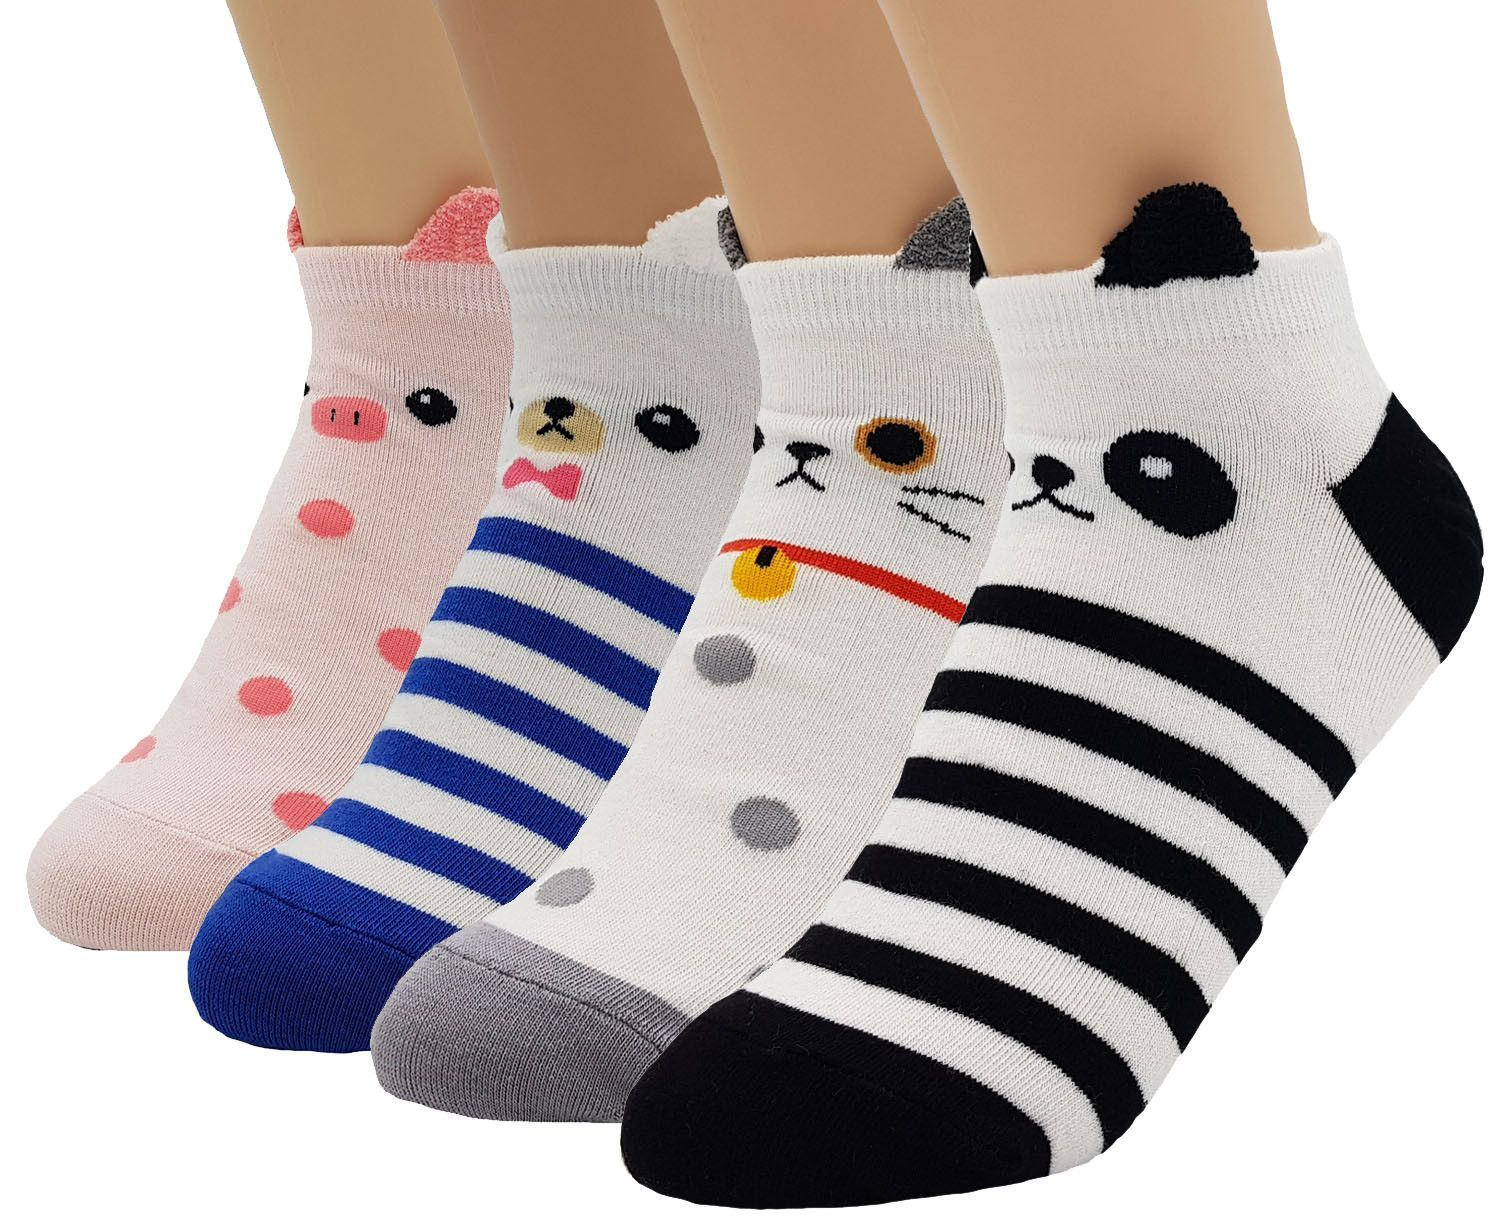 Ladies Girls Fashion ankle socks cotton rich size 4-7 Designer Multi Theme!